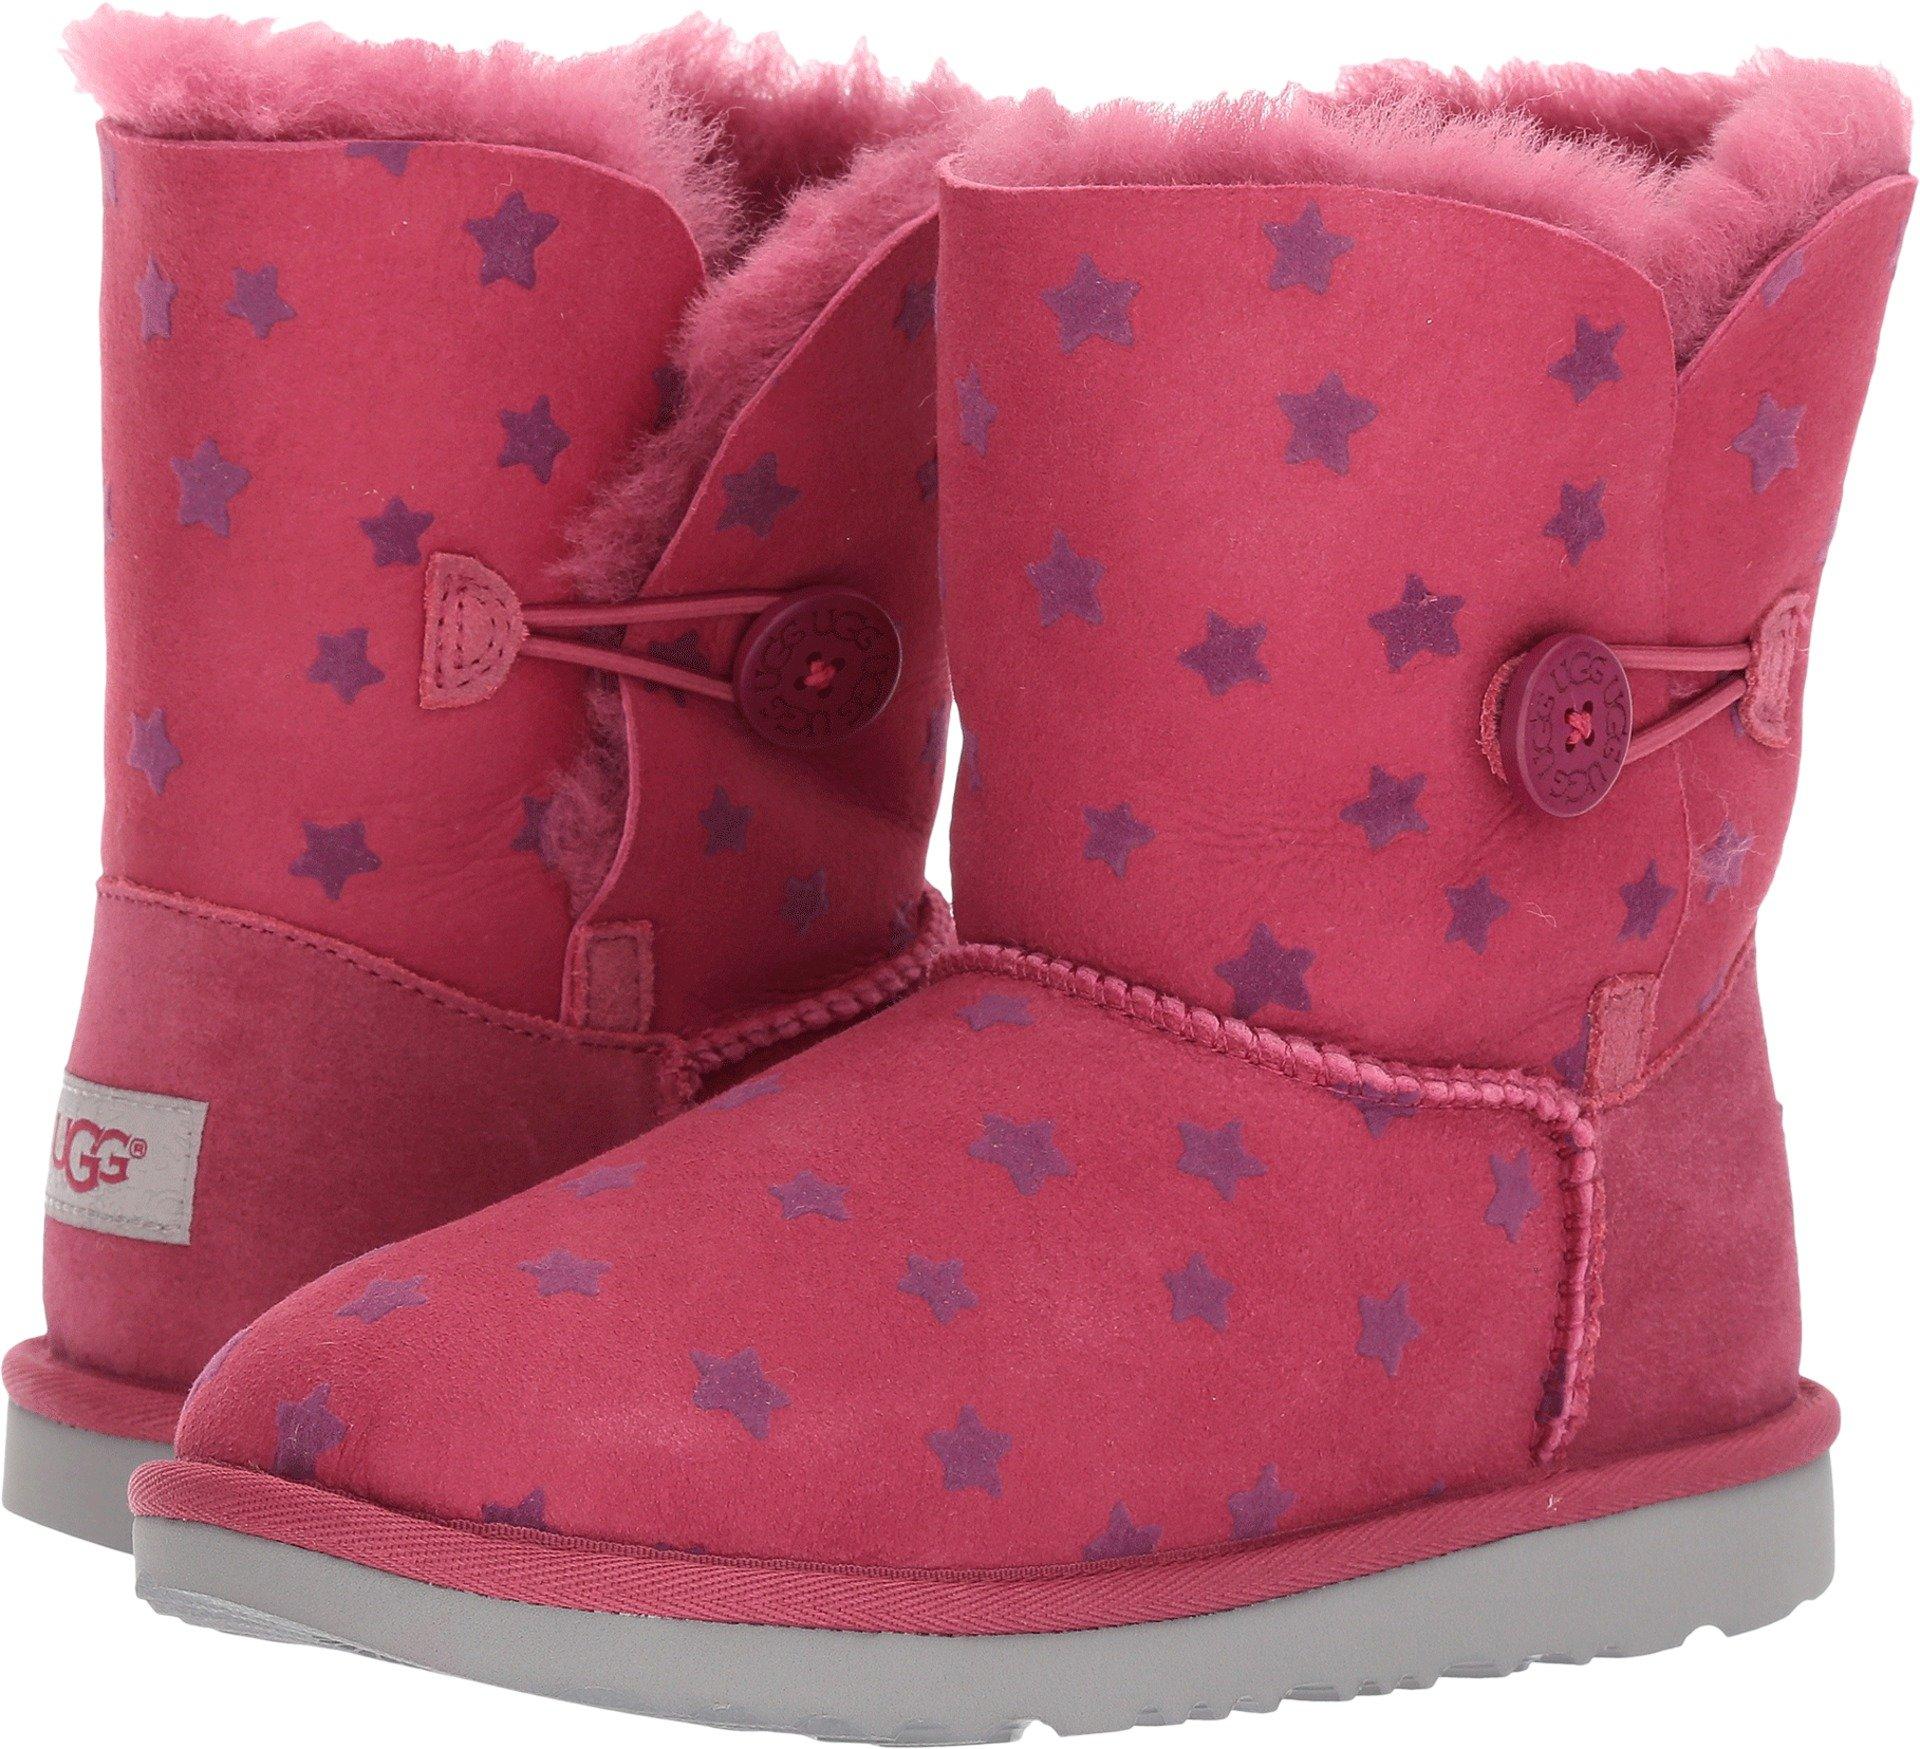 UGG Girls K Bailey Button II Stars Pull-on Boot, Brambleberry, 4 M US Big Kid